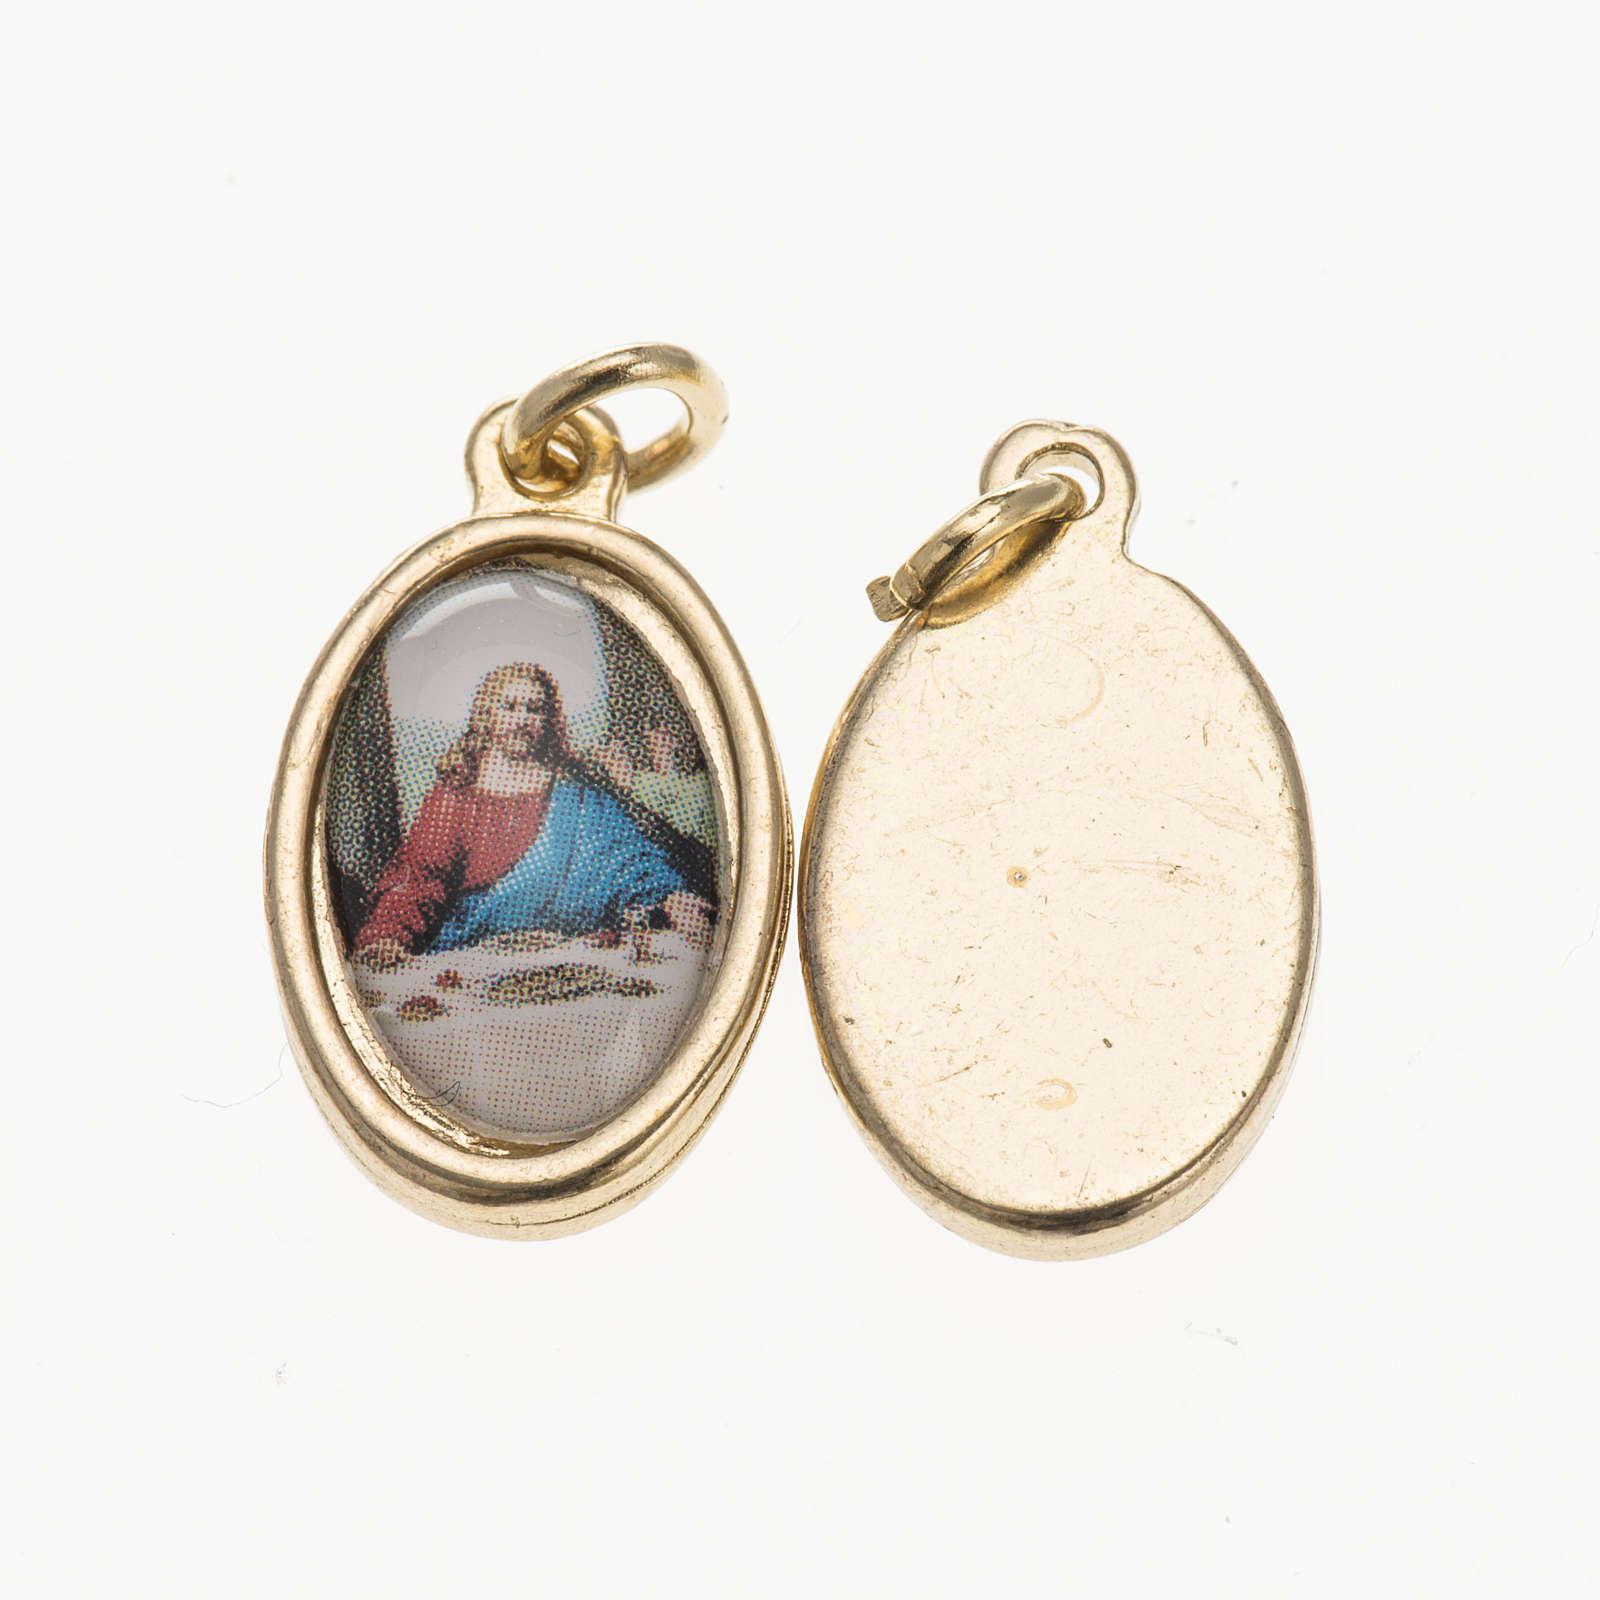 Medalla Última Cena metal dorado resina 1,5x1cm 4